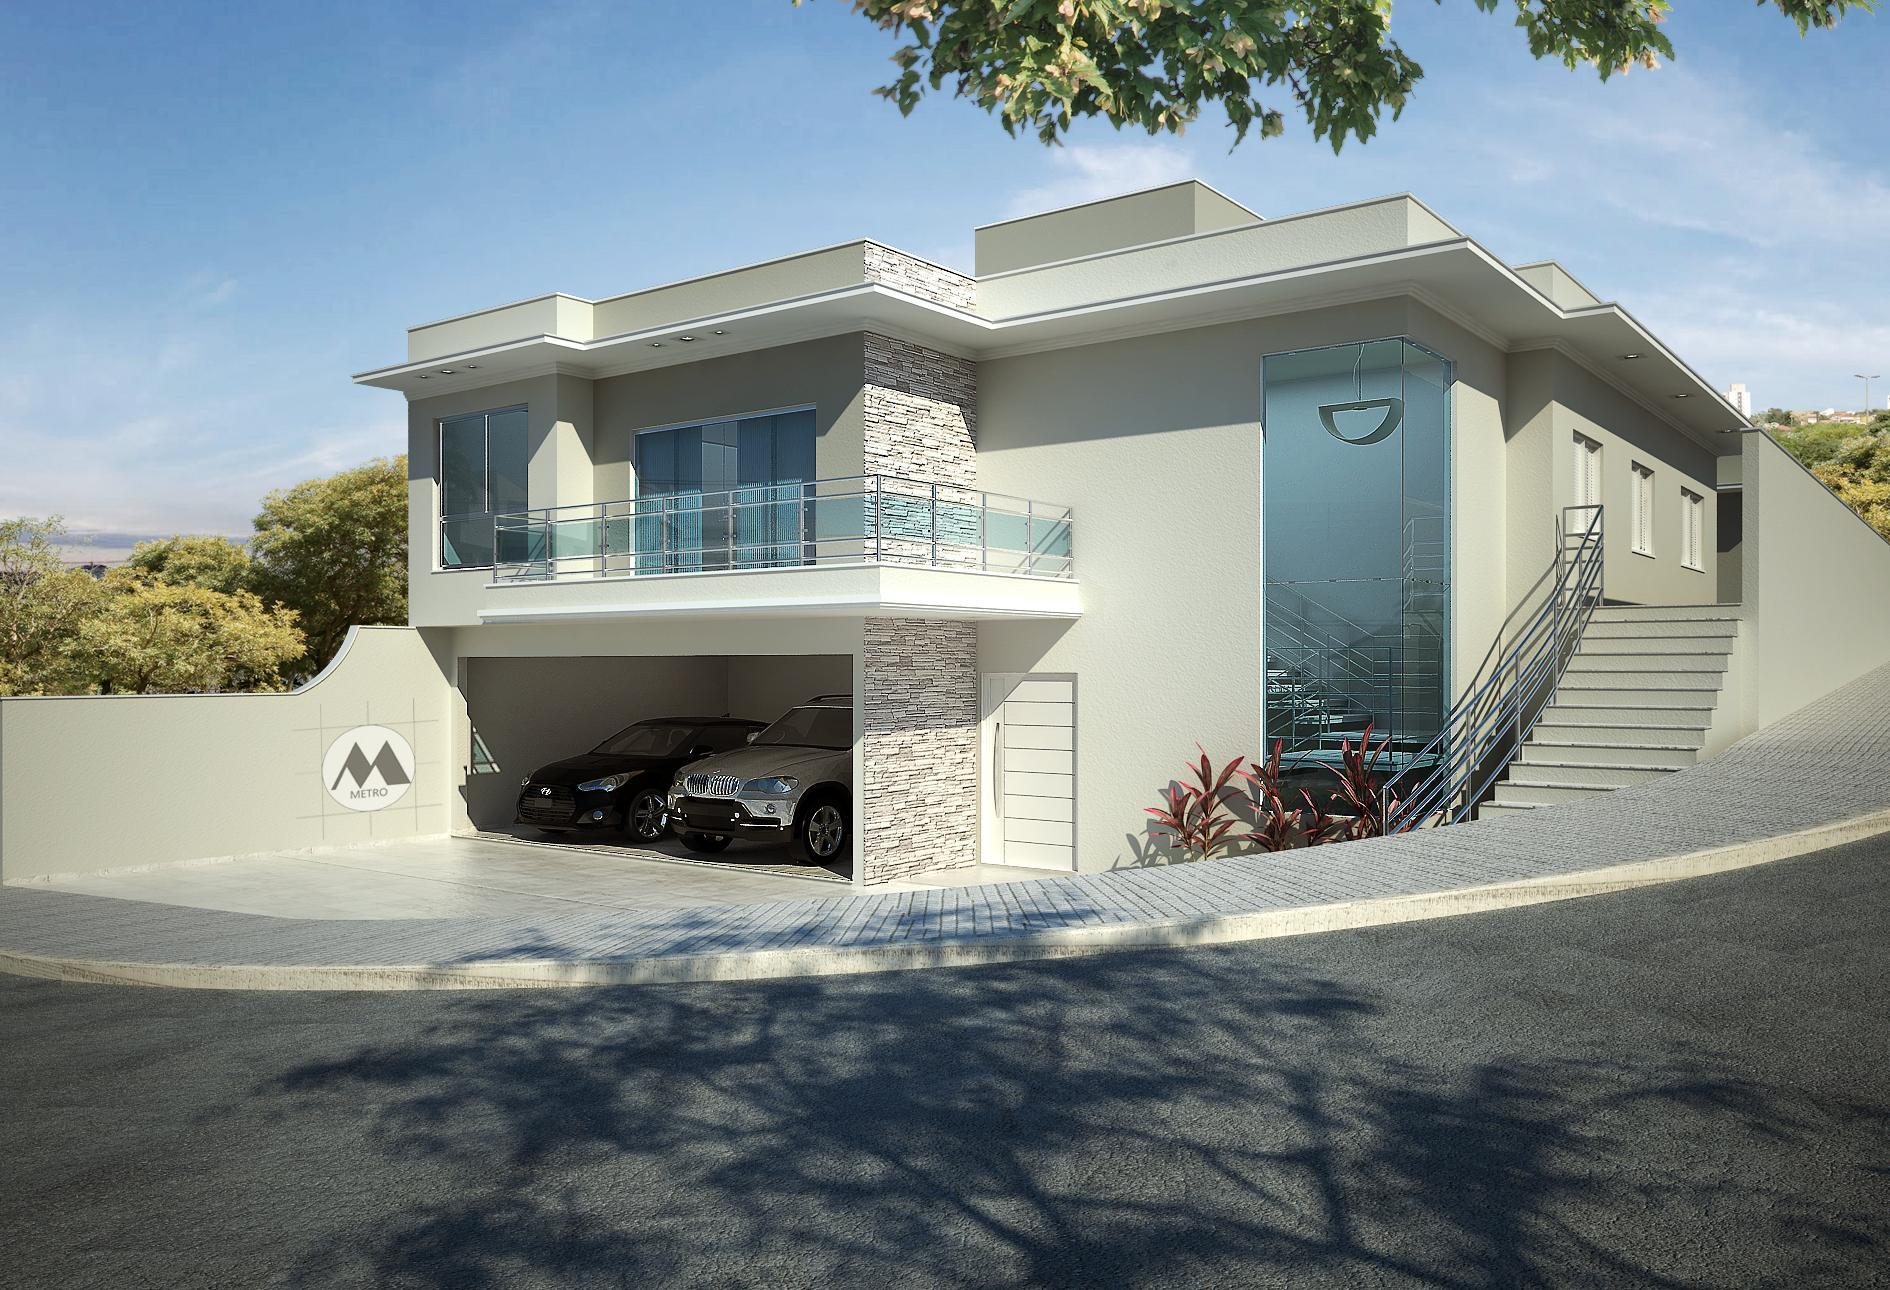 50 fachadas de casas de esquina lindas e inspiradoras for Modelo de casa esquinera